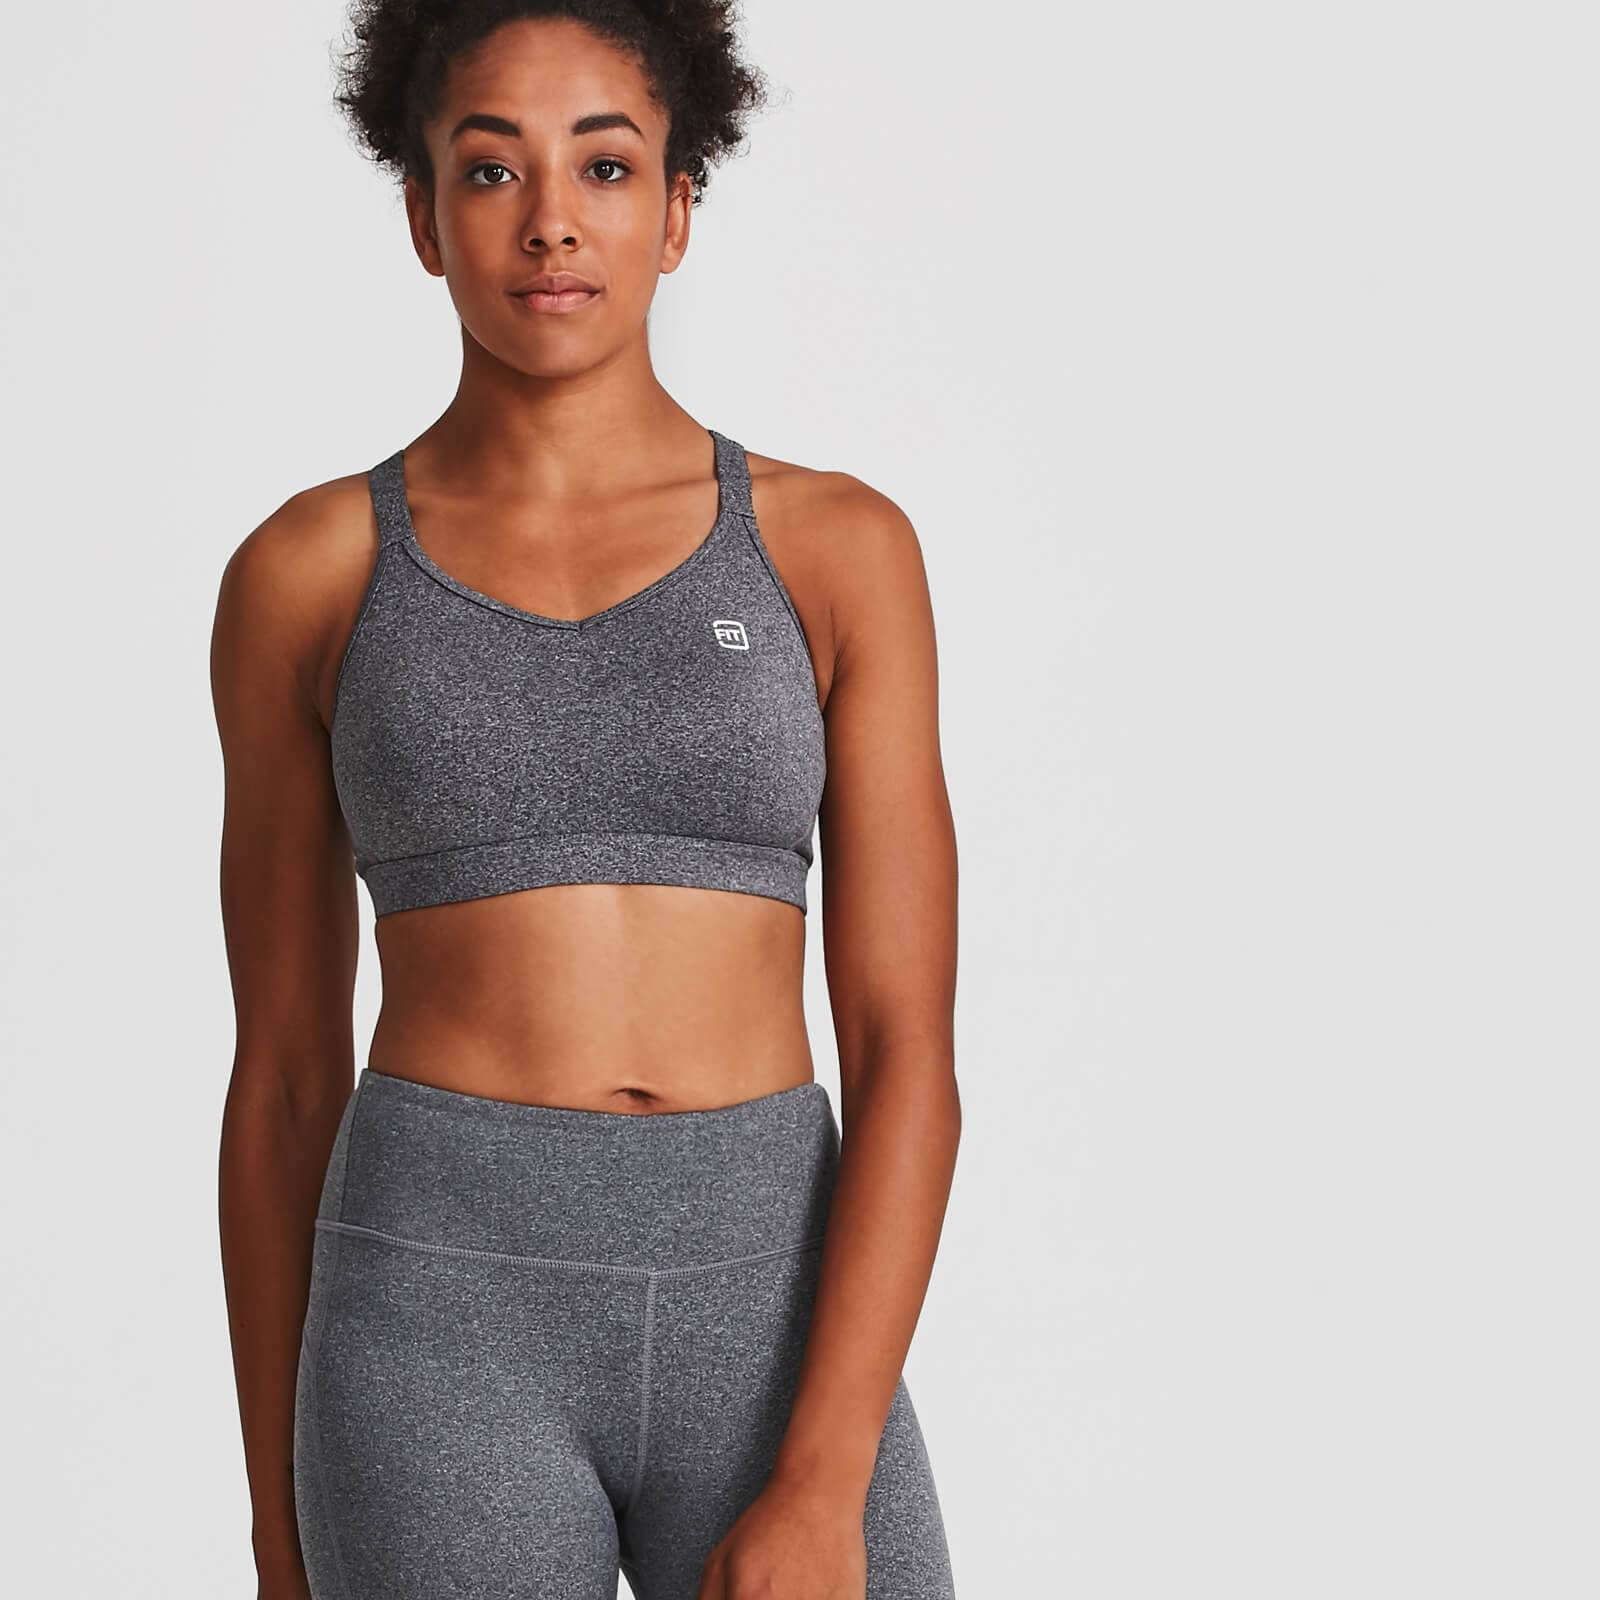 IdealFit Core Sports Bra - Grey - S - Grey